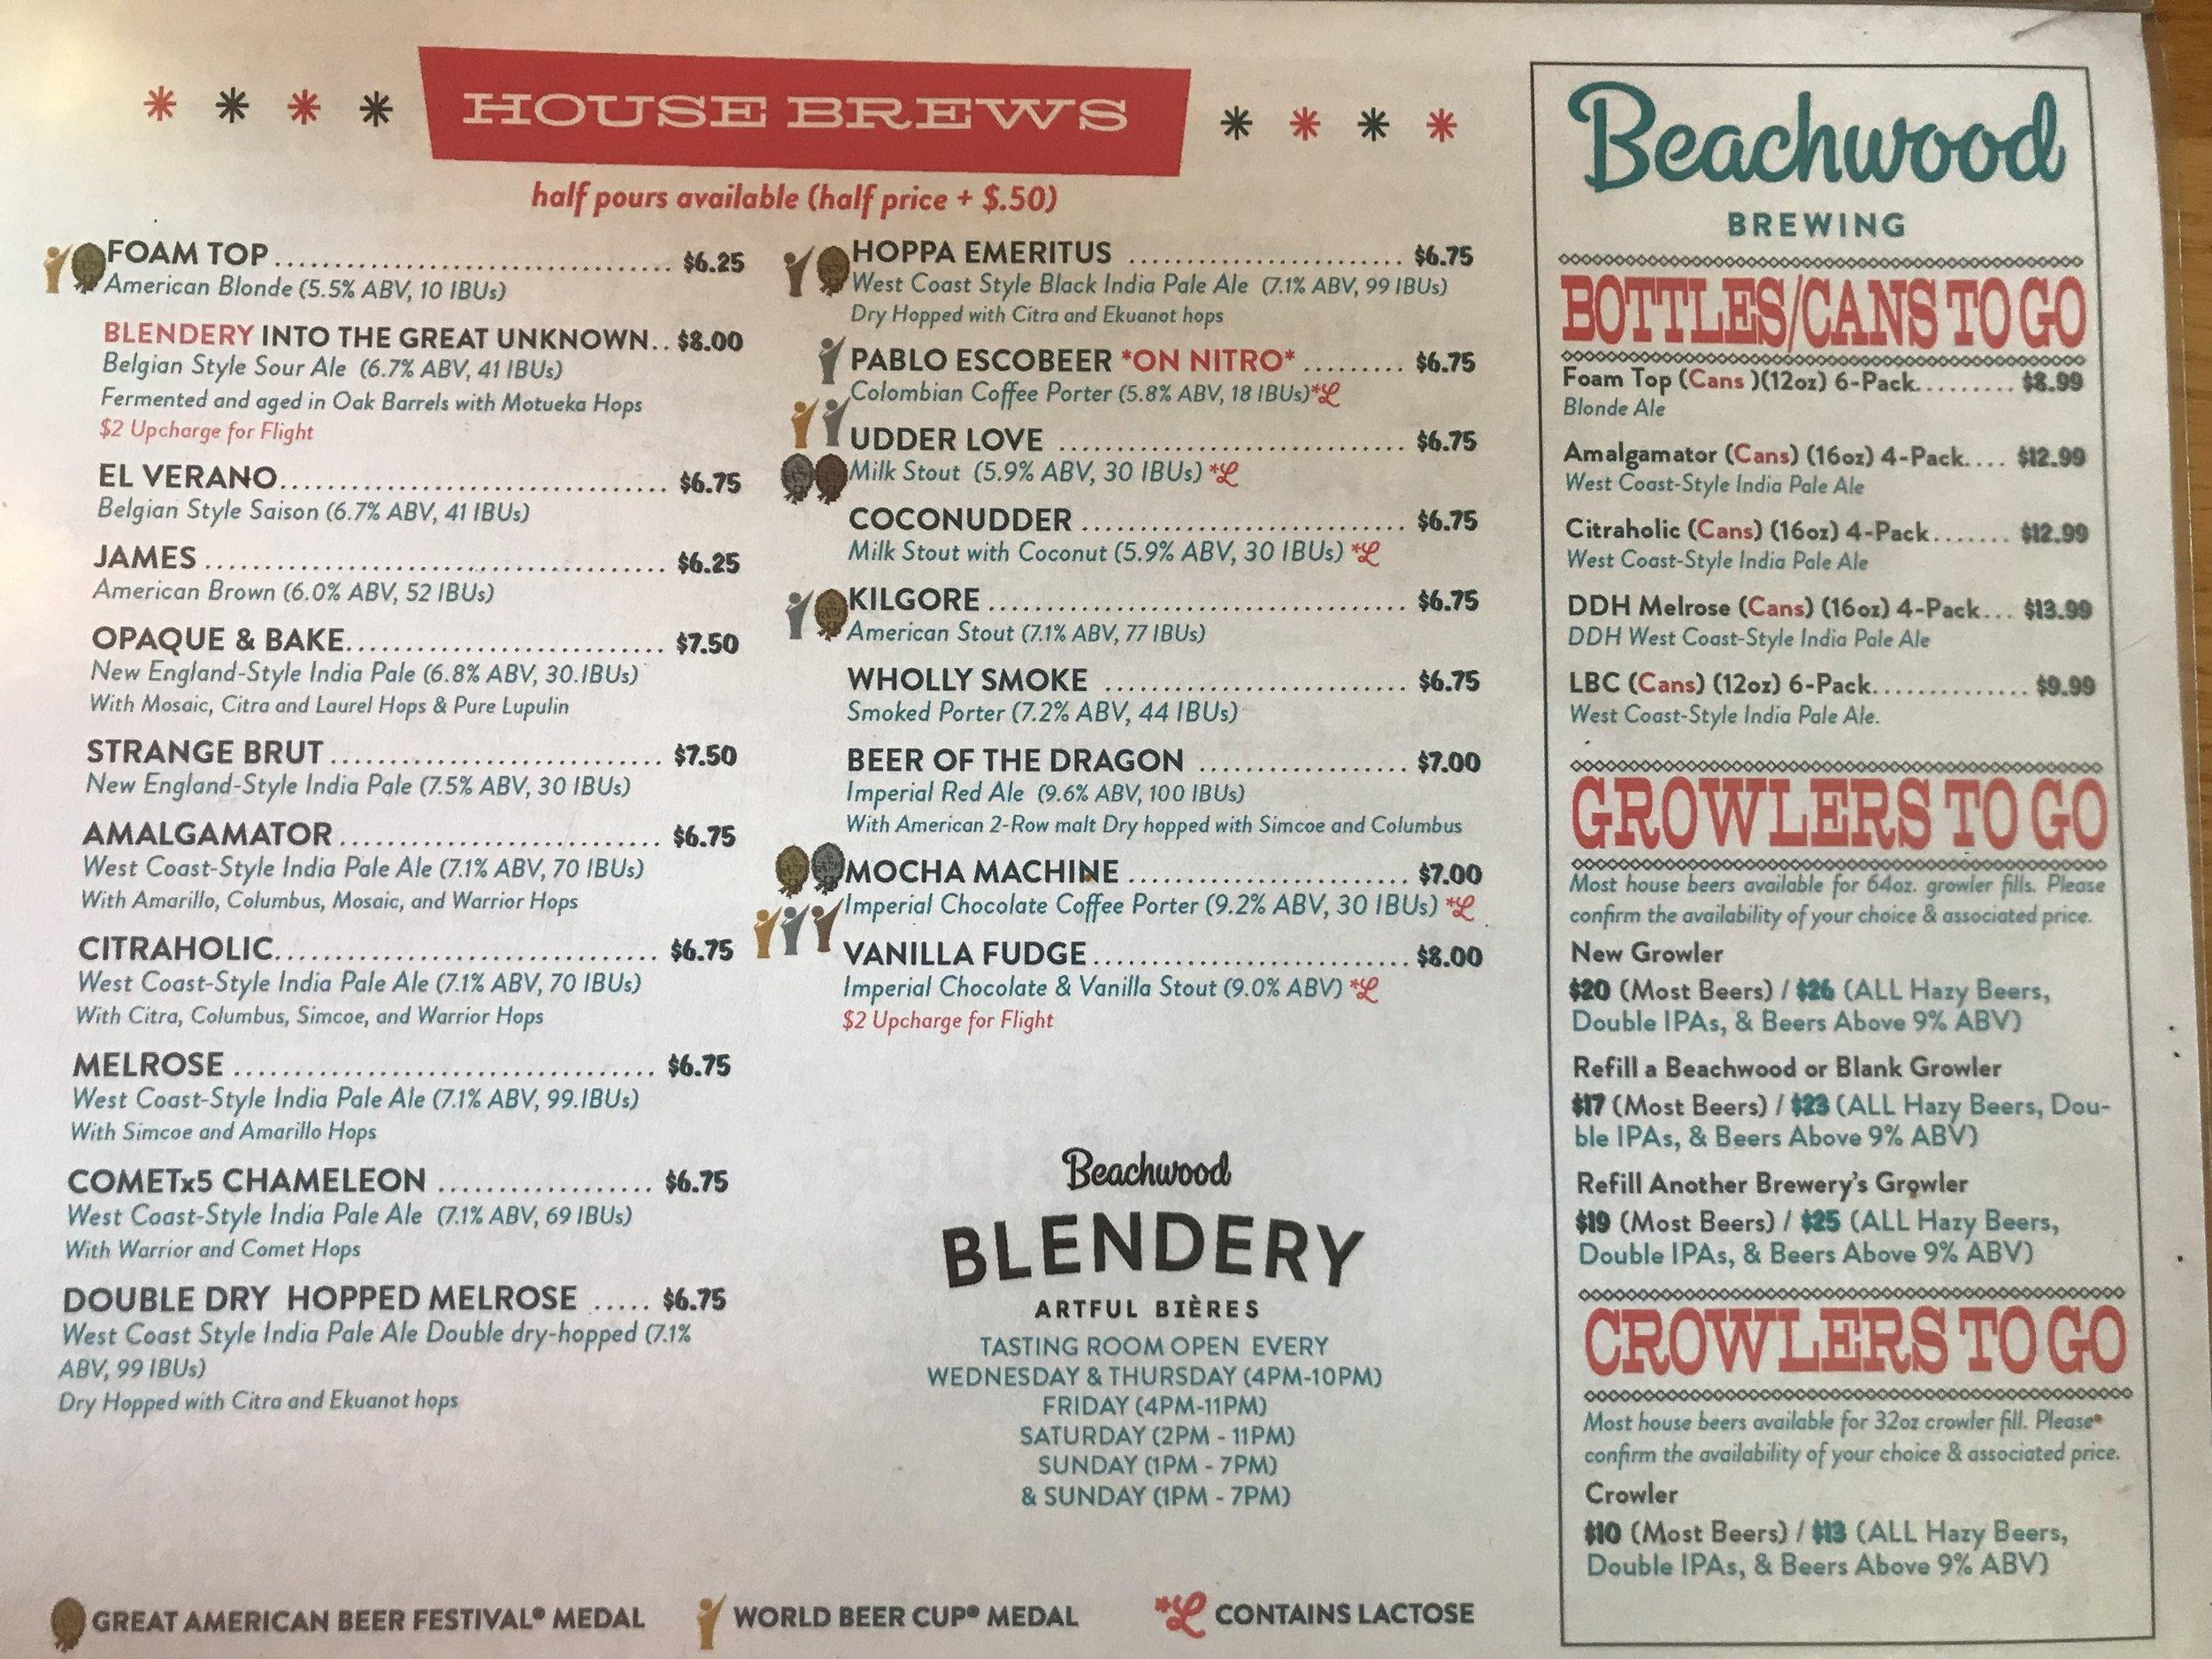 beachwood-brewing-menu